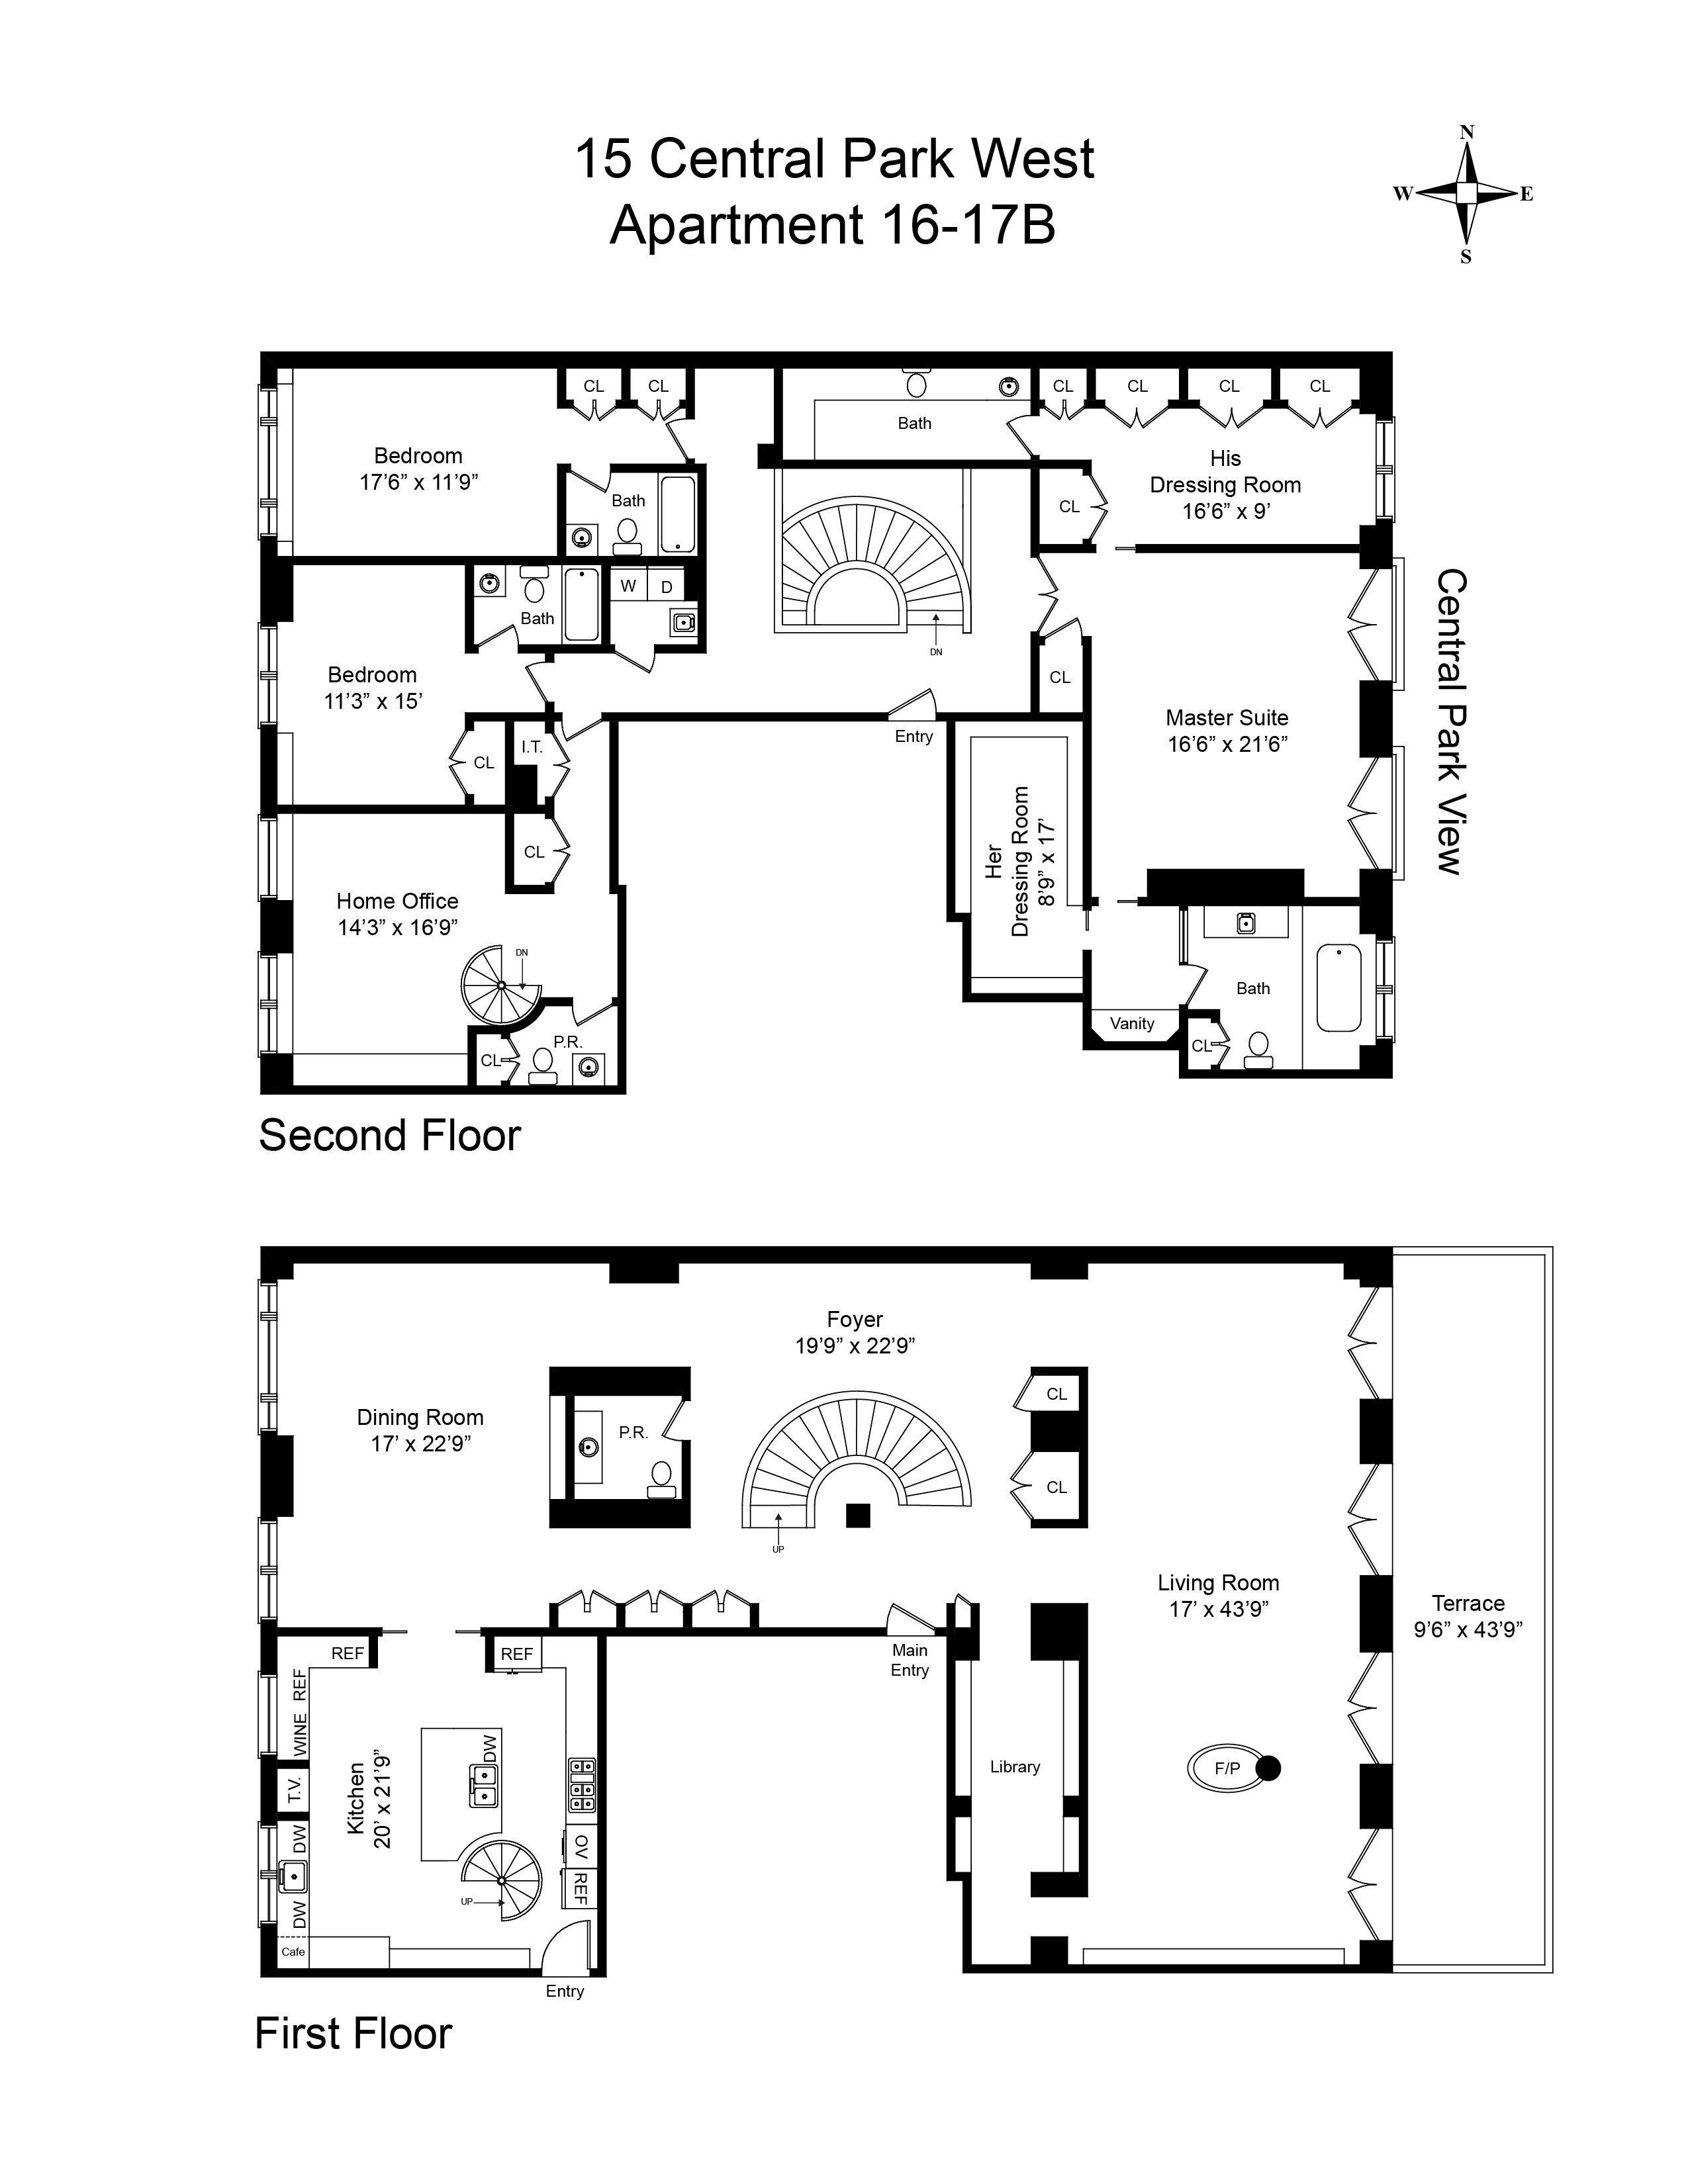 floorplan0 Floor plans, Penthouse apartment floor plan